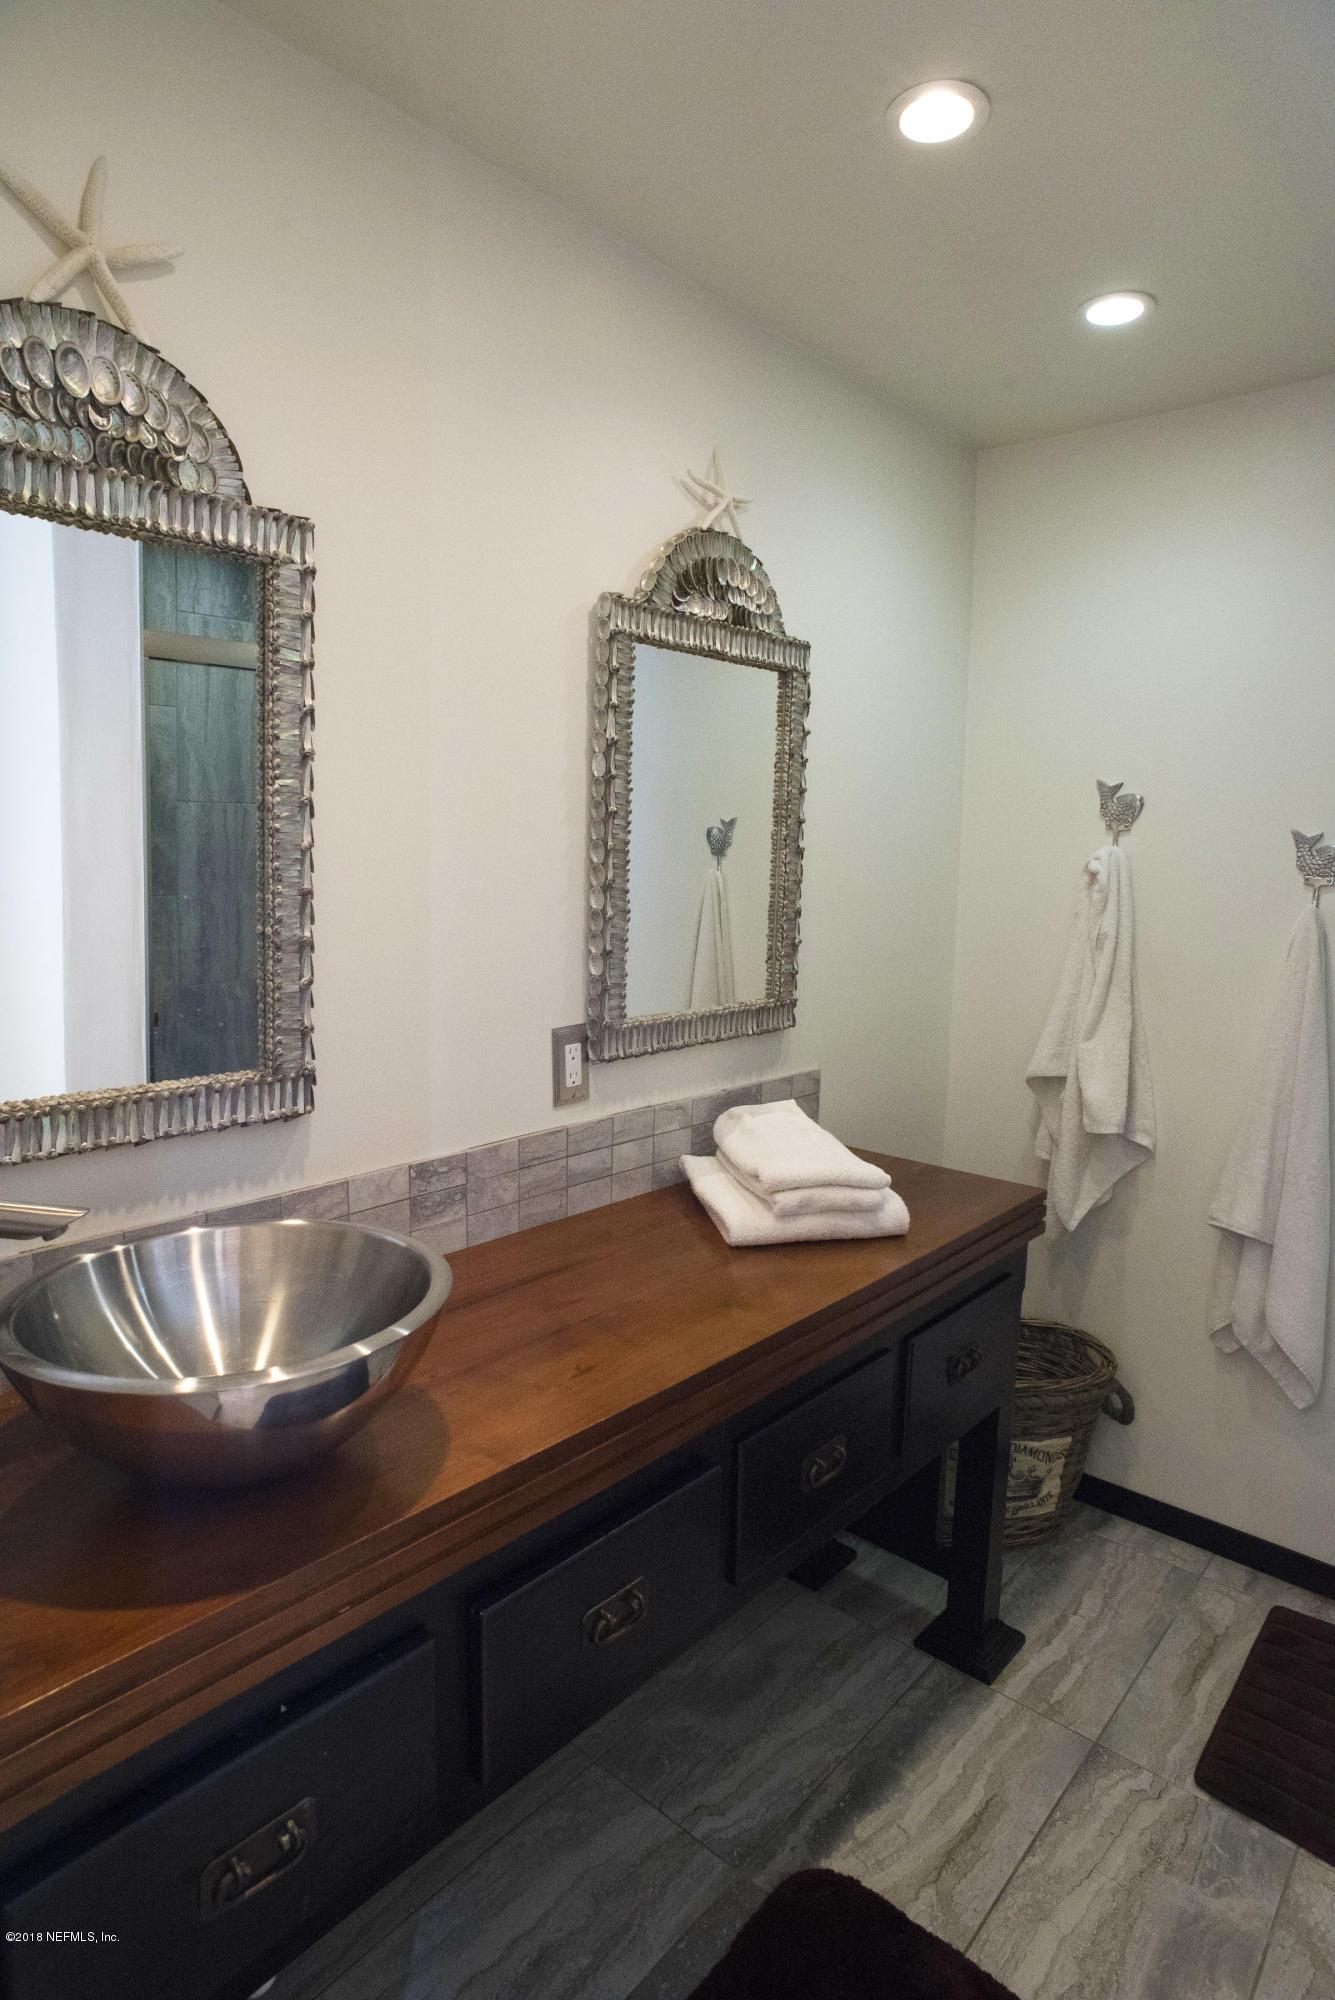 56 DUFFERIN, ST AUGUSTINE, FLORIDA 32084, 4 Bedrooms Bedrooms, ,3 BathroomsBathrooms,Residential - single family,For sale,DUFFERIN,927704